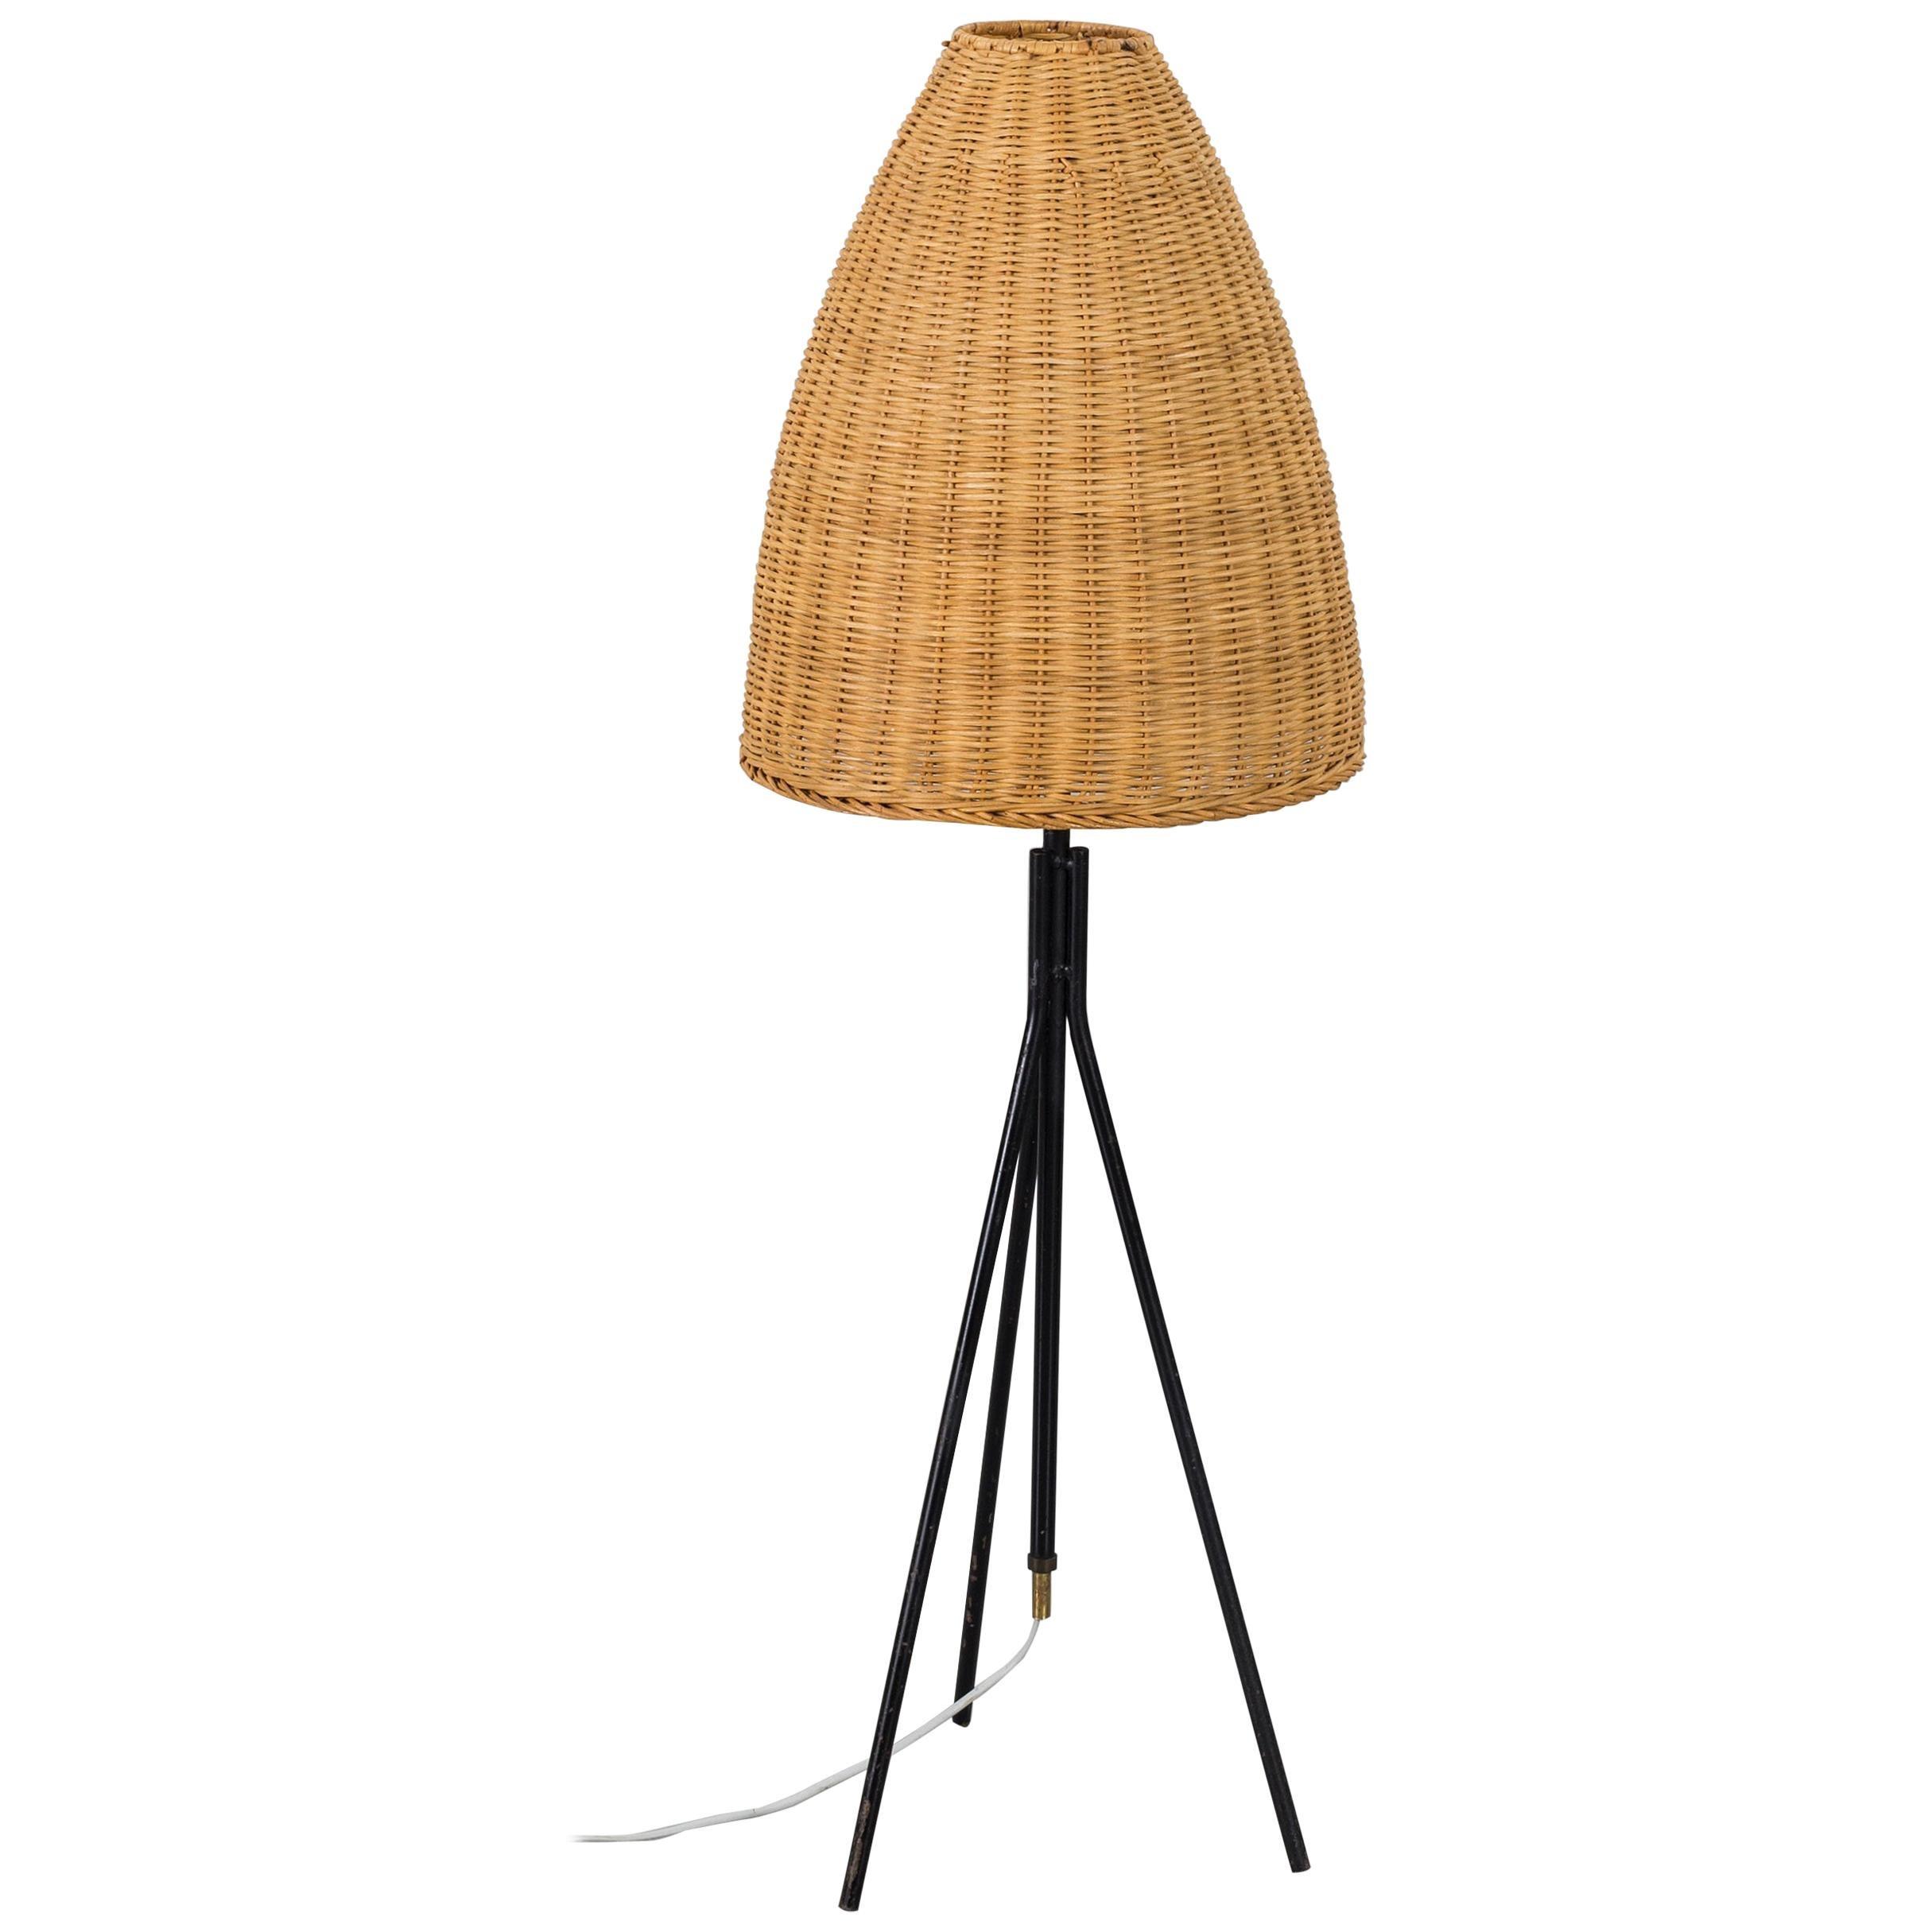 Mid-20th Century Italian Wicker Light